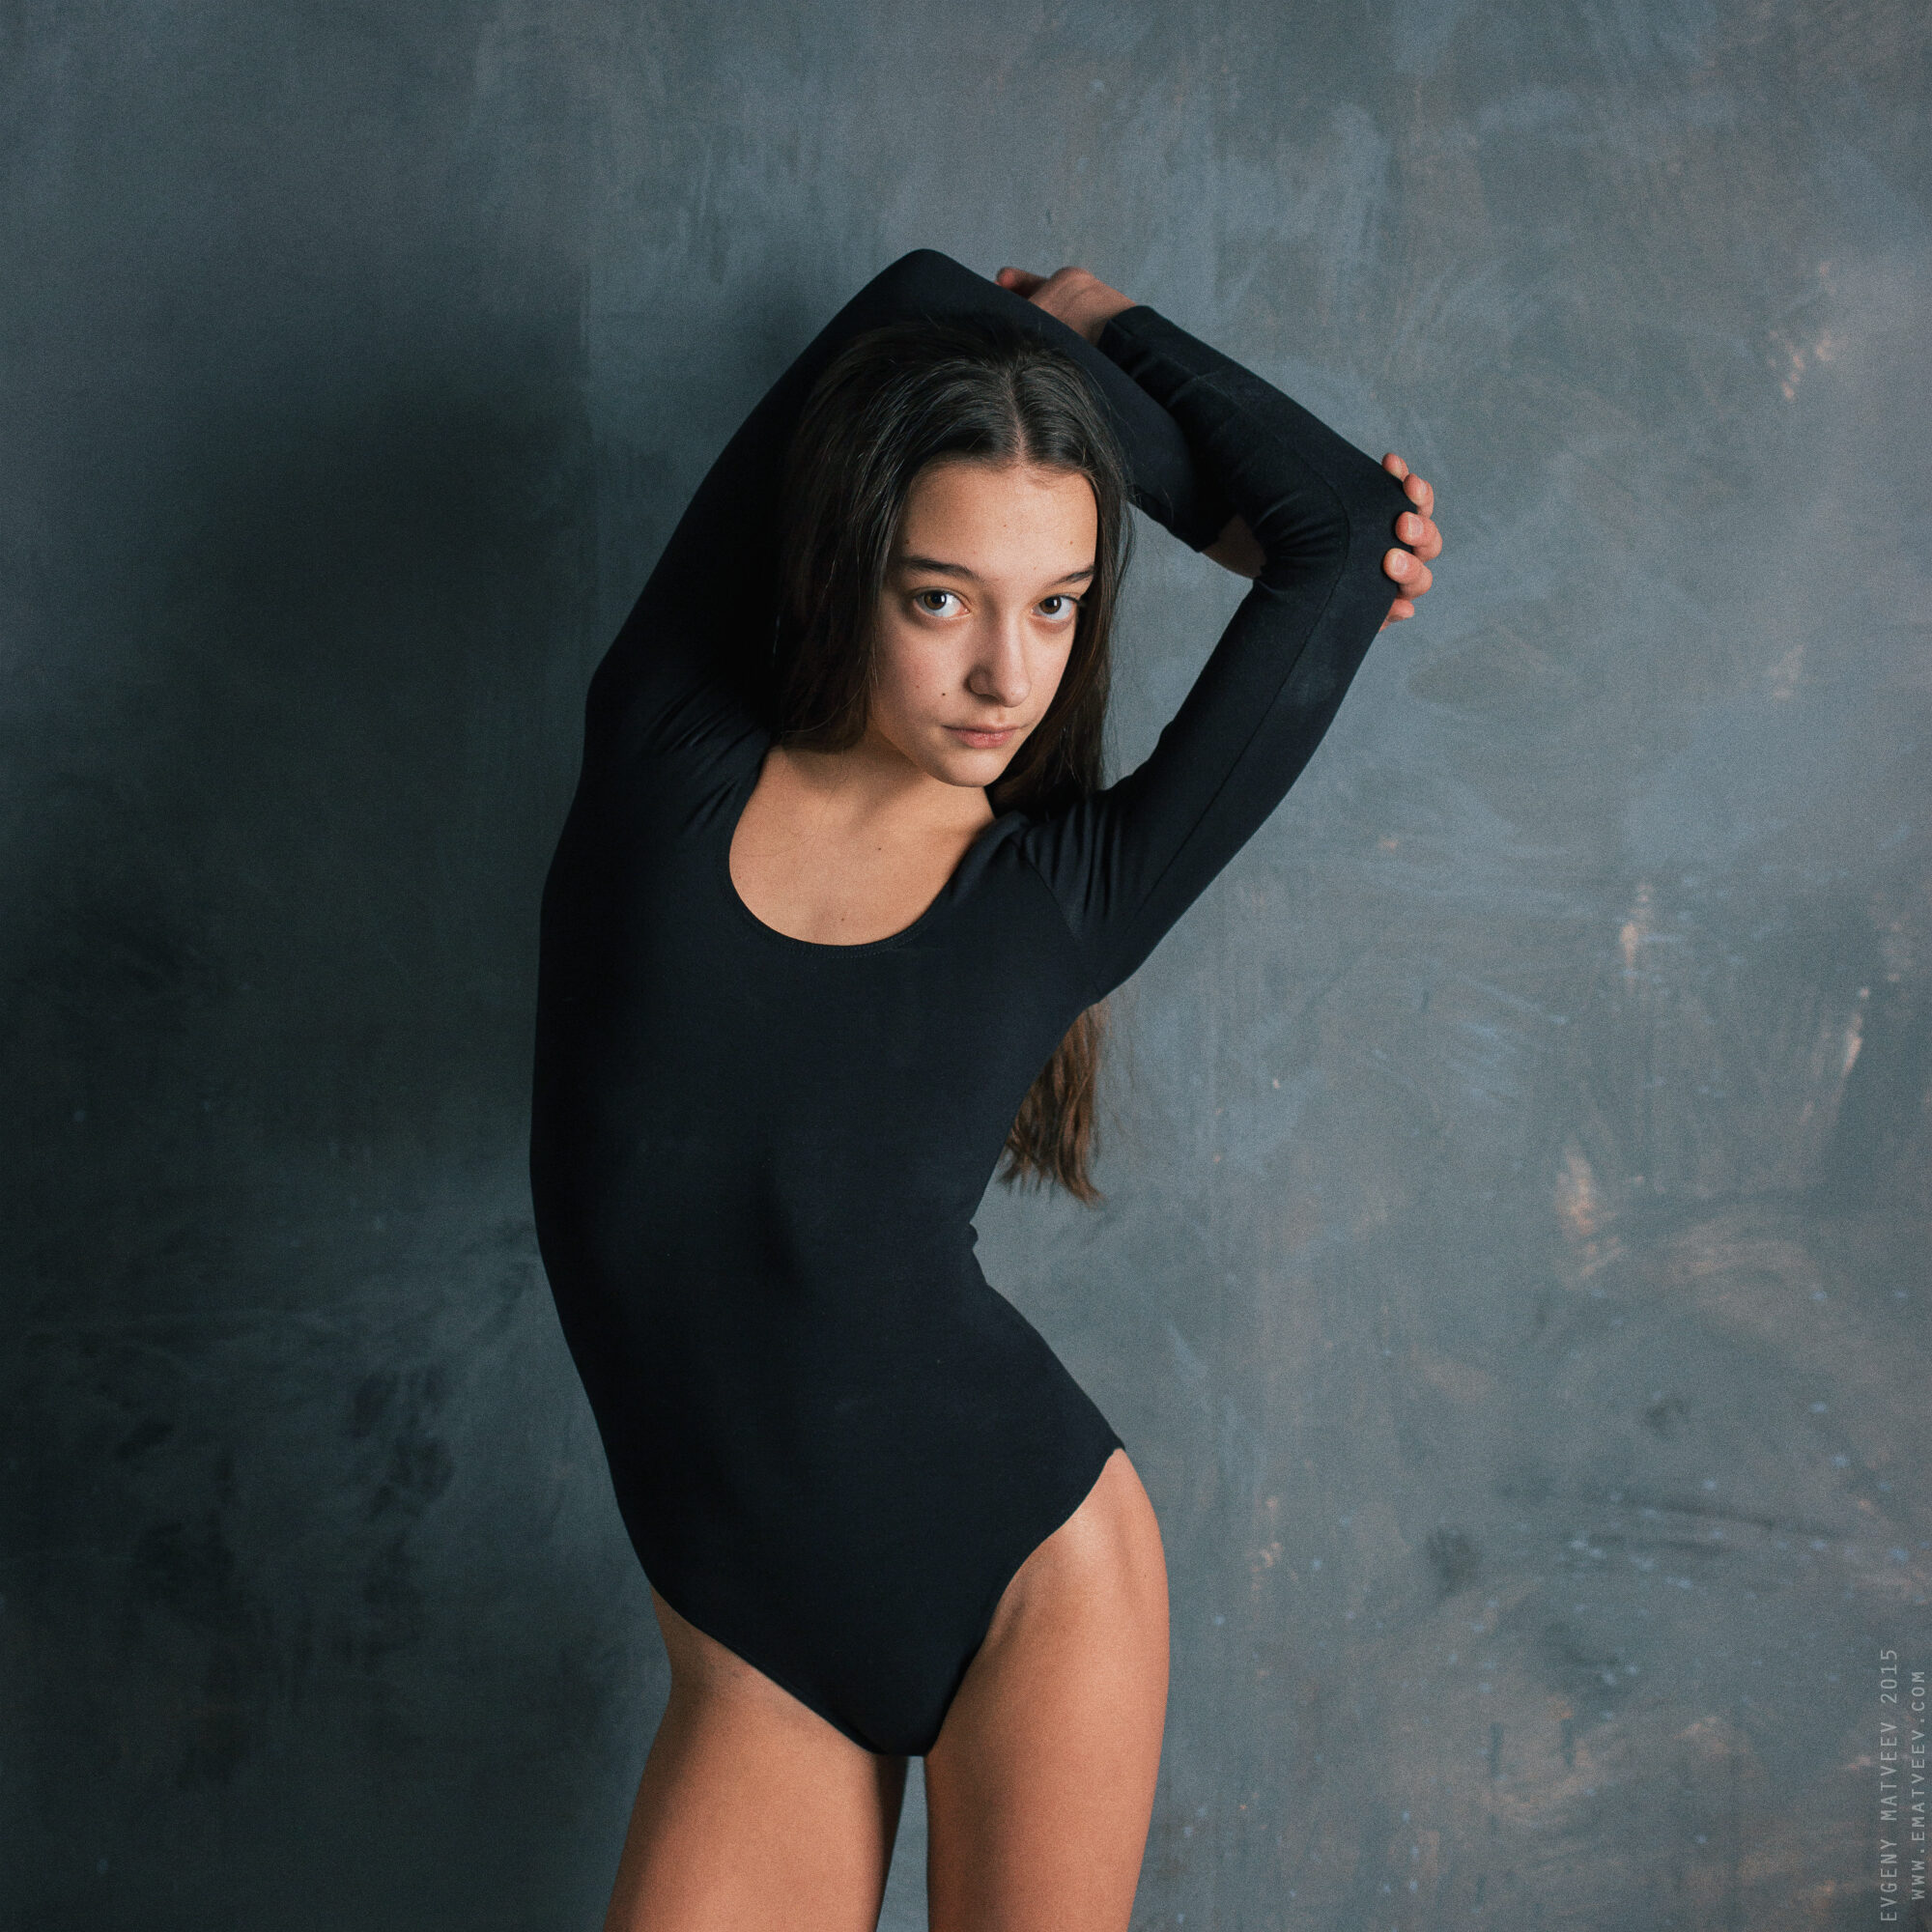 ellina_s_studio_011-2000x2000.jpg